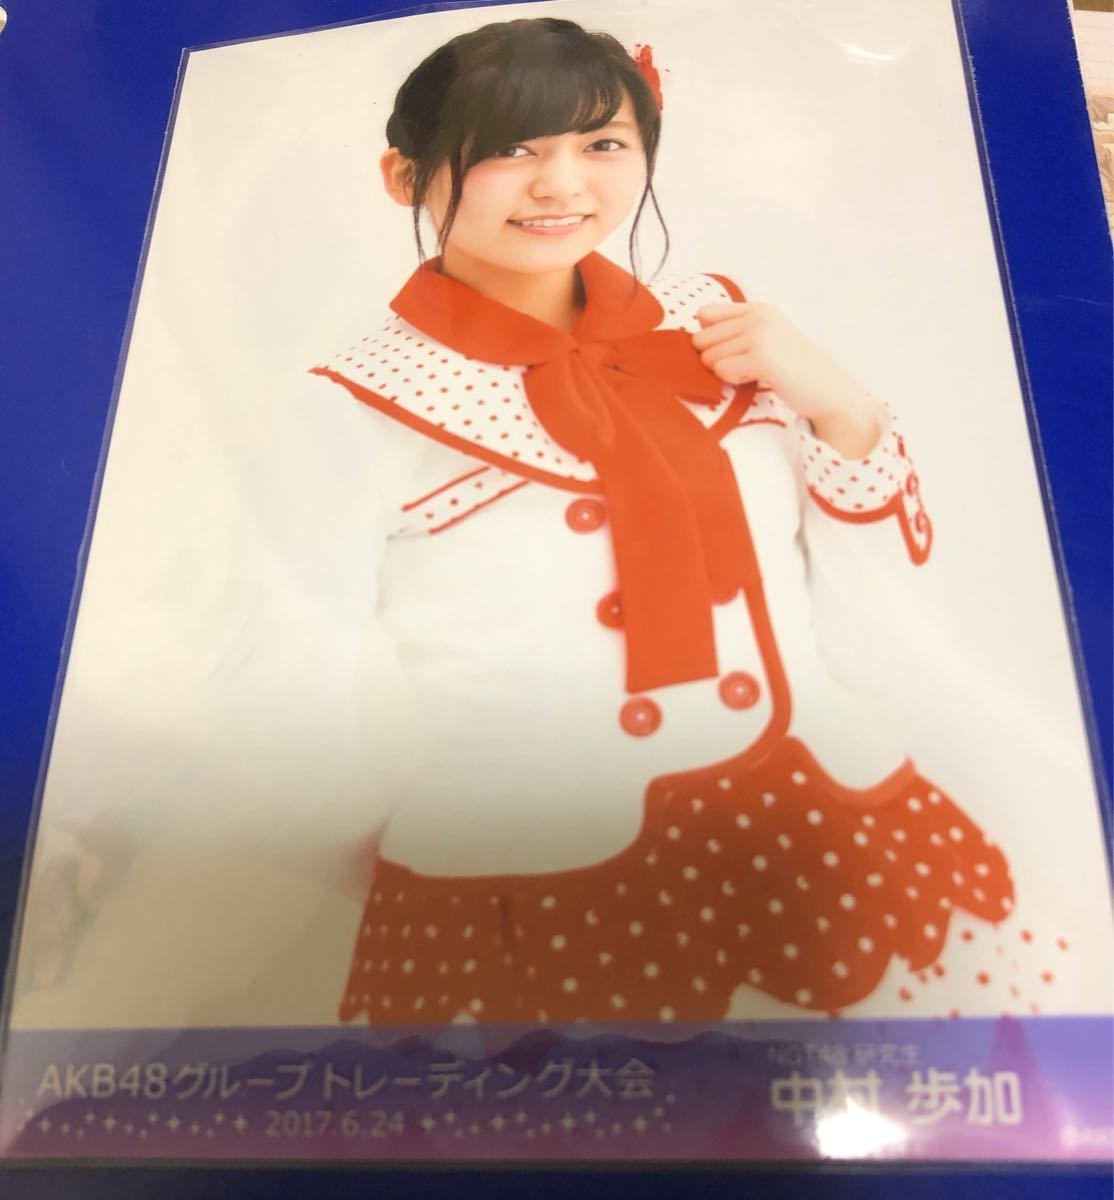 AKB48グループ トレーディング大会 中村歩加 NGT48  生写真